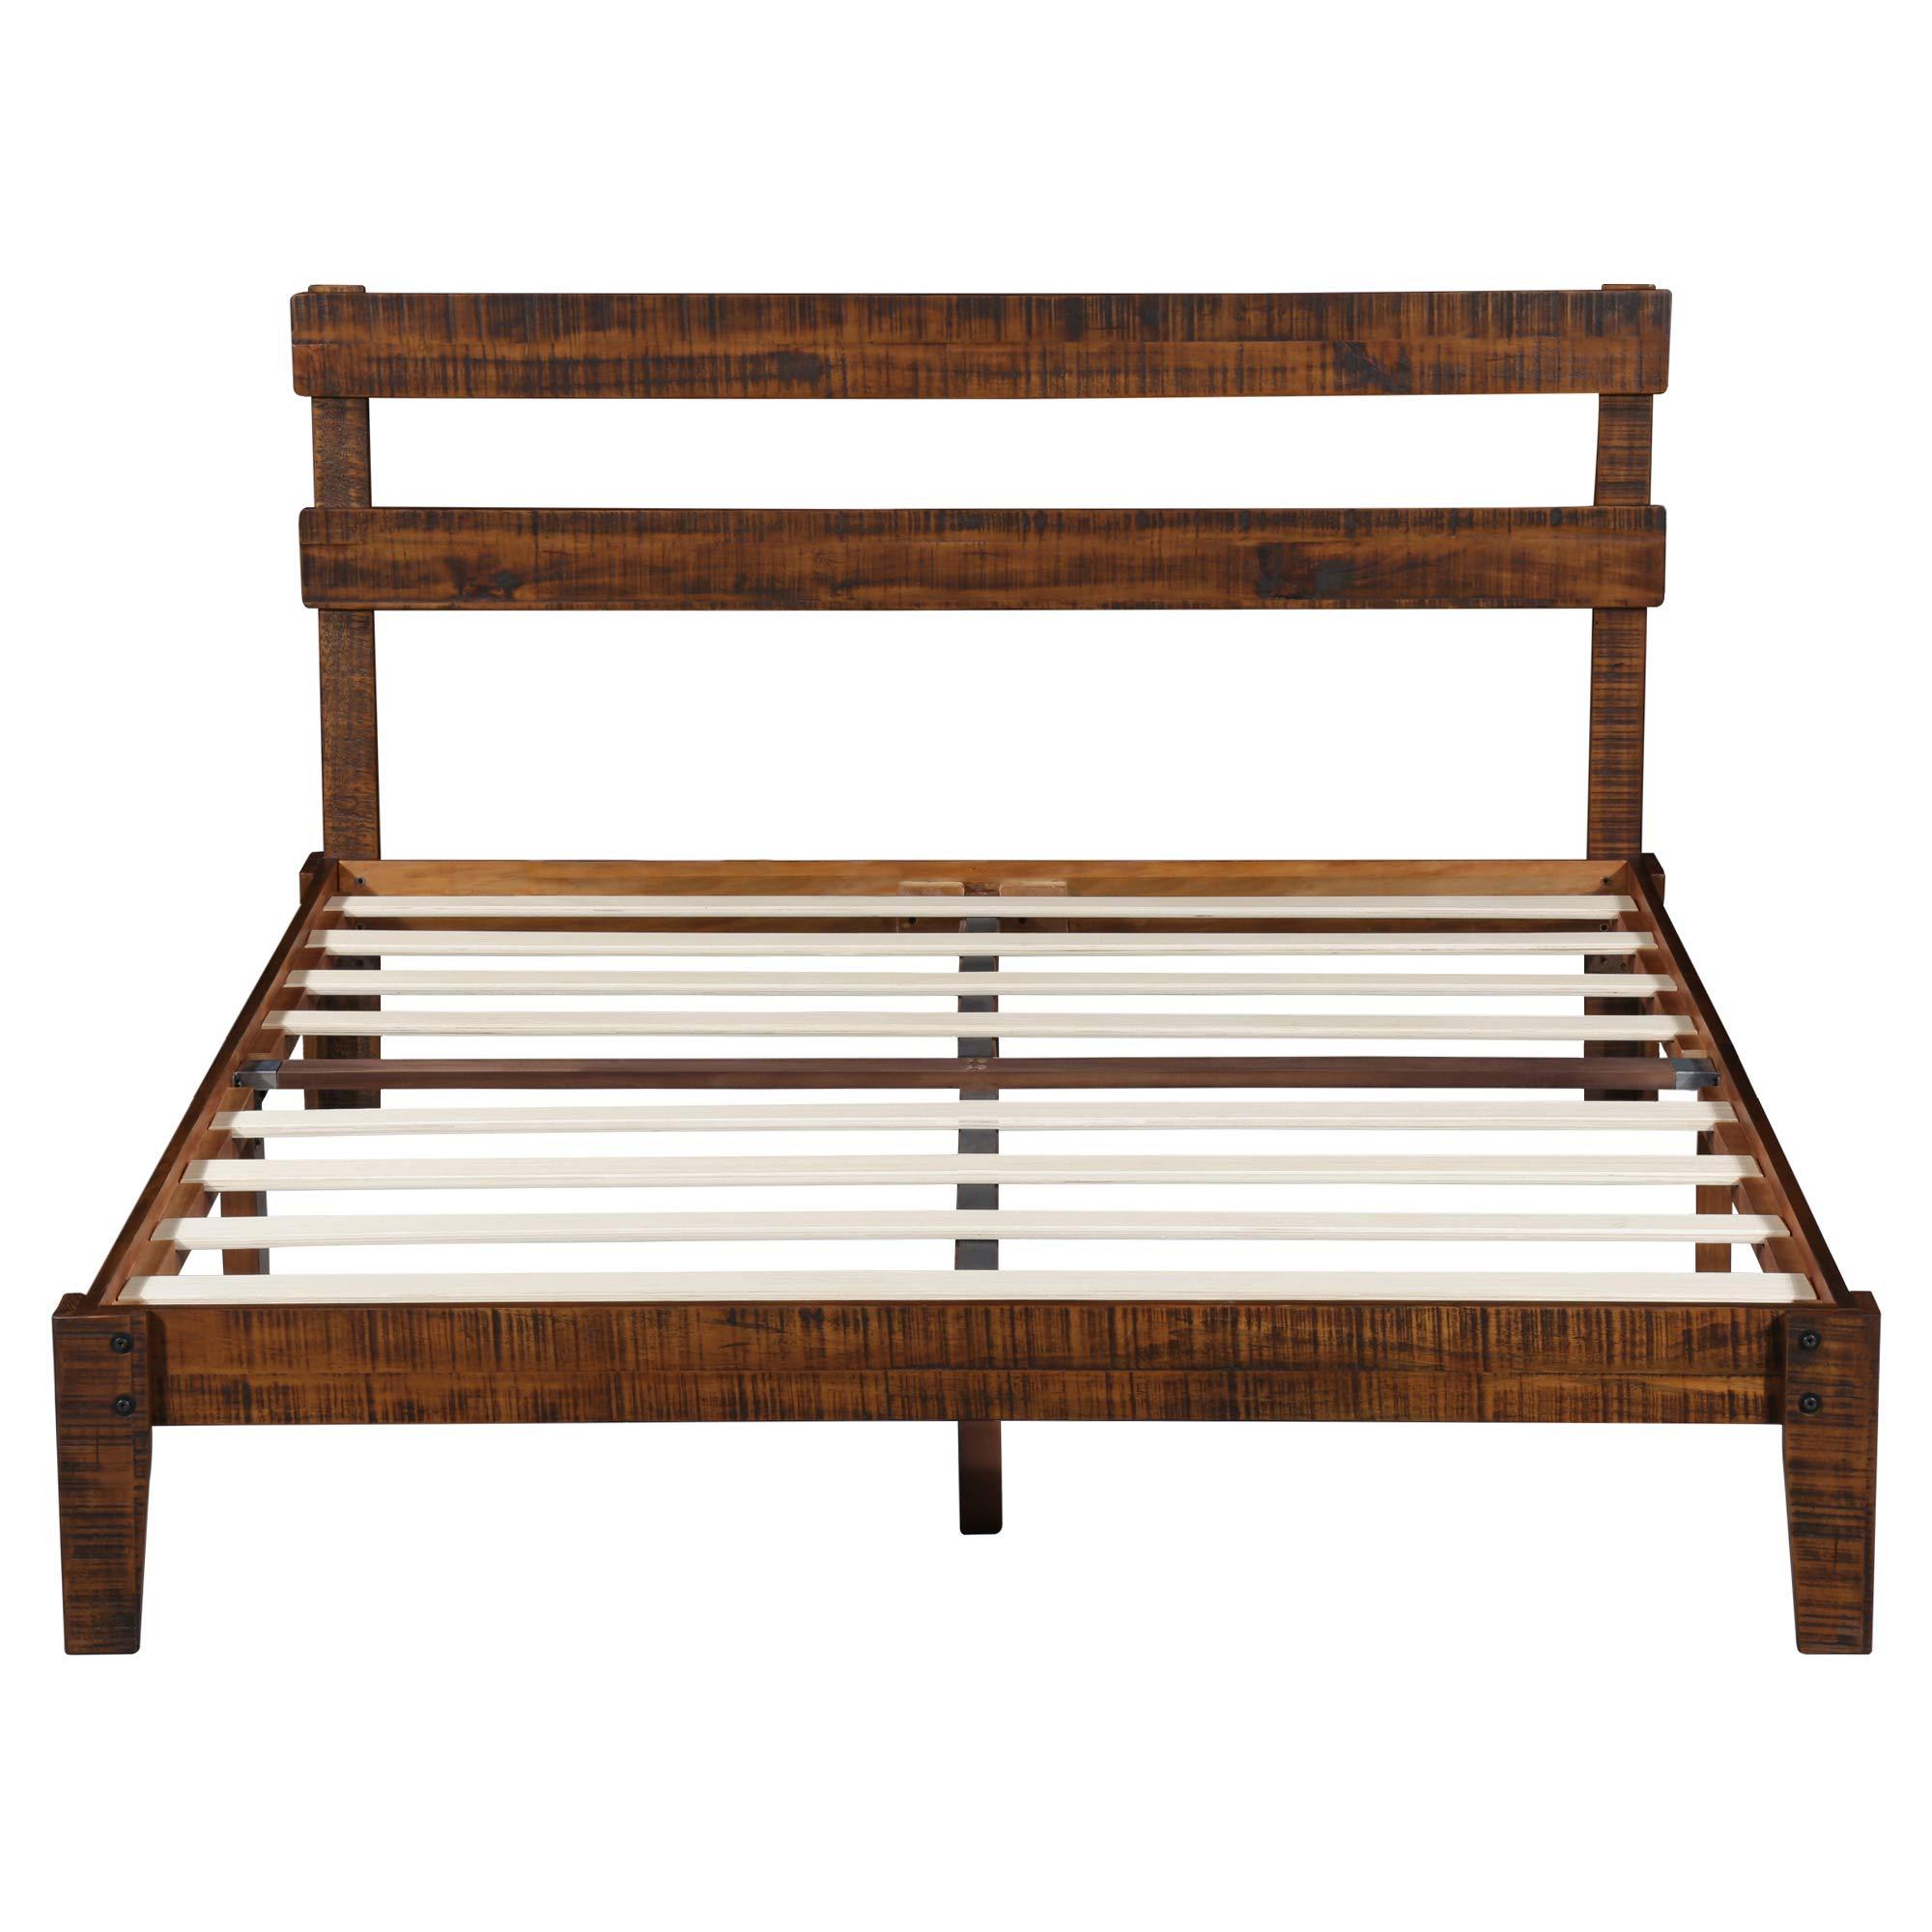 PrimaSleep PR38SF02Q 12 inch Platform Headboard/Wood Slat Support Bed Frame/Noise Free, Queen Brown